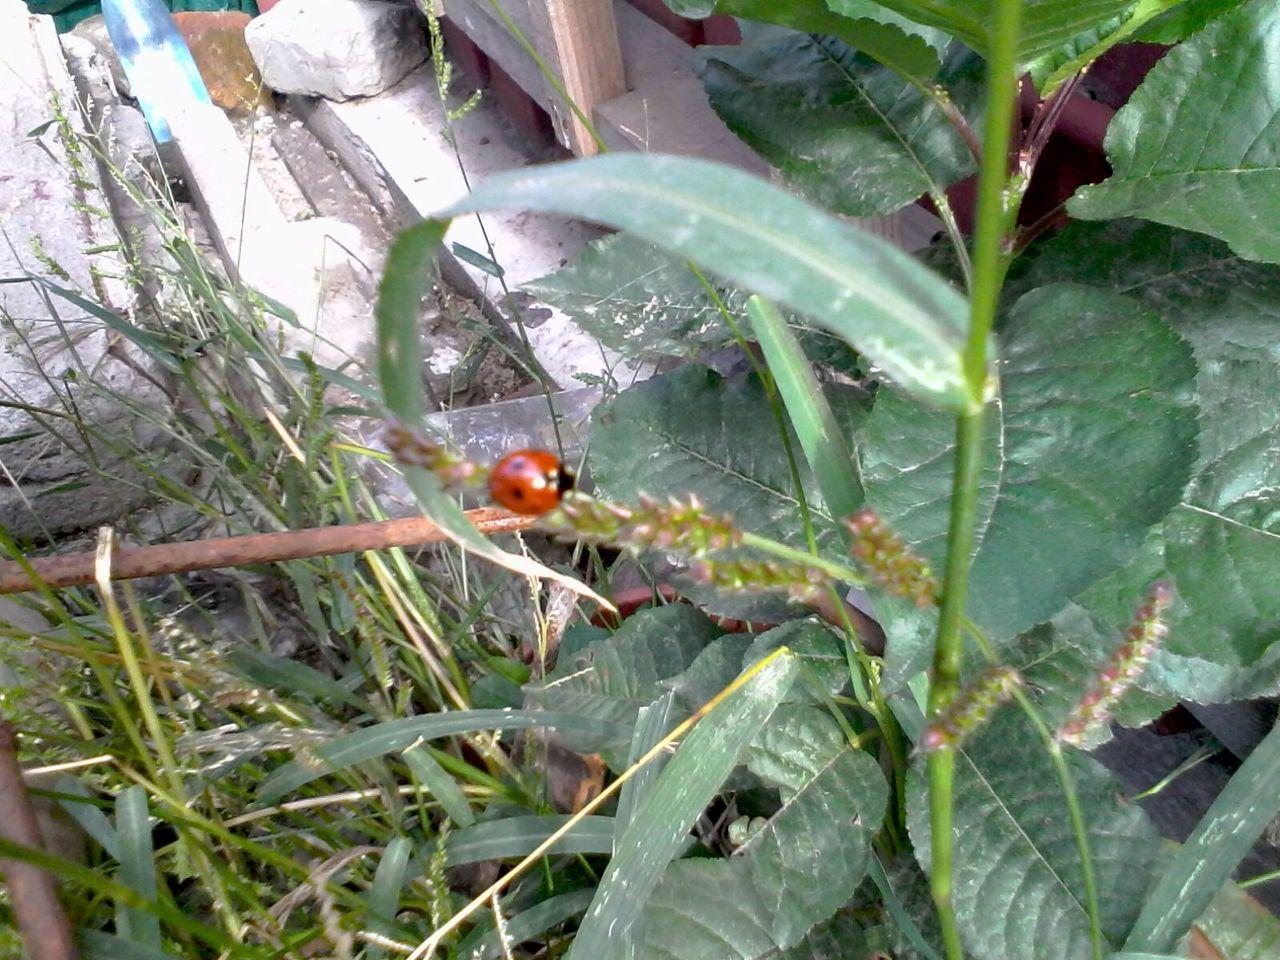 Ladybug Ladybeetle Green Plants Grass Unedited Eyeem Market Wolfzuachis